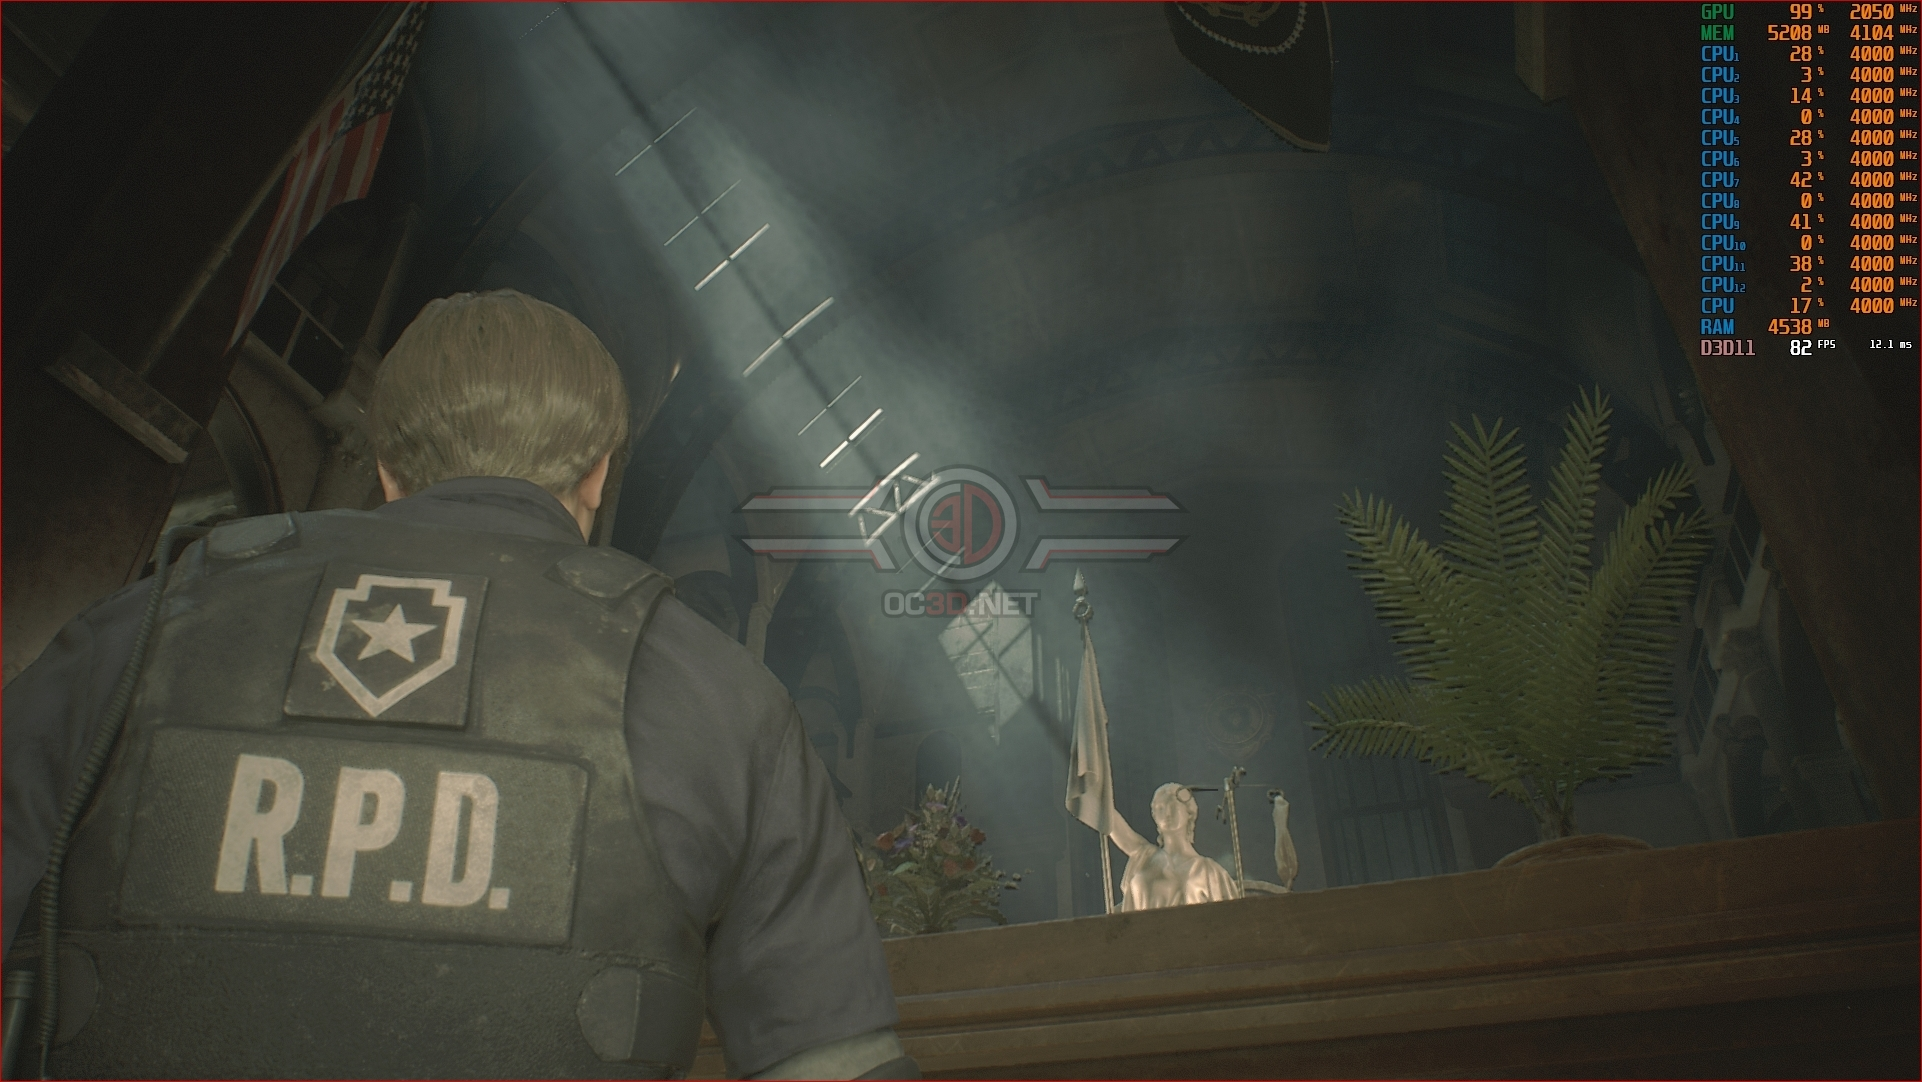 Resident Evil 2 Remake PC Performance Review | Optimising